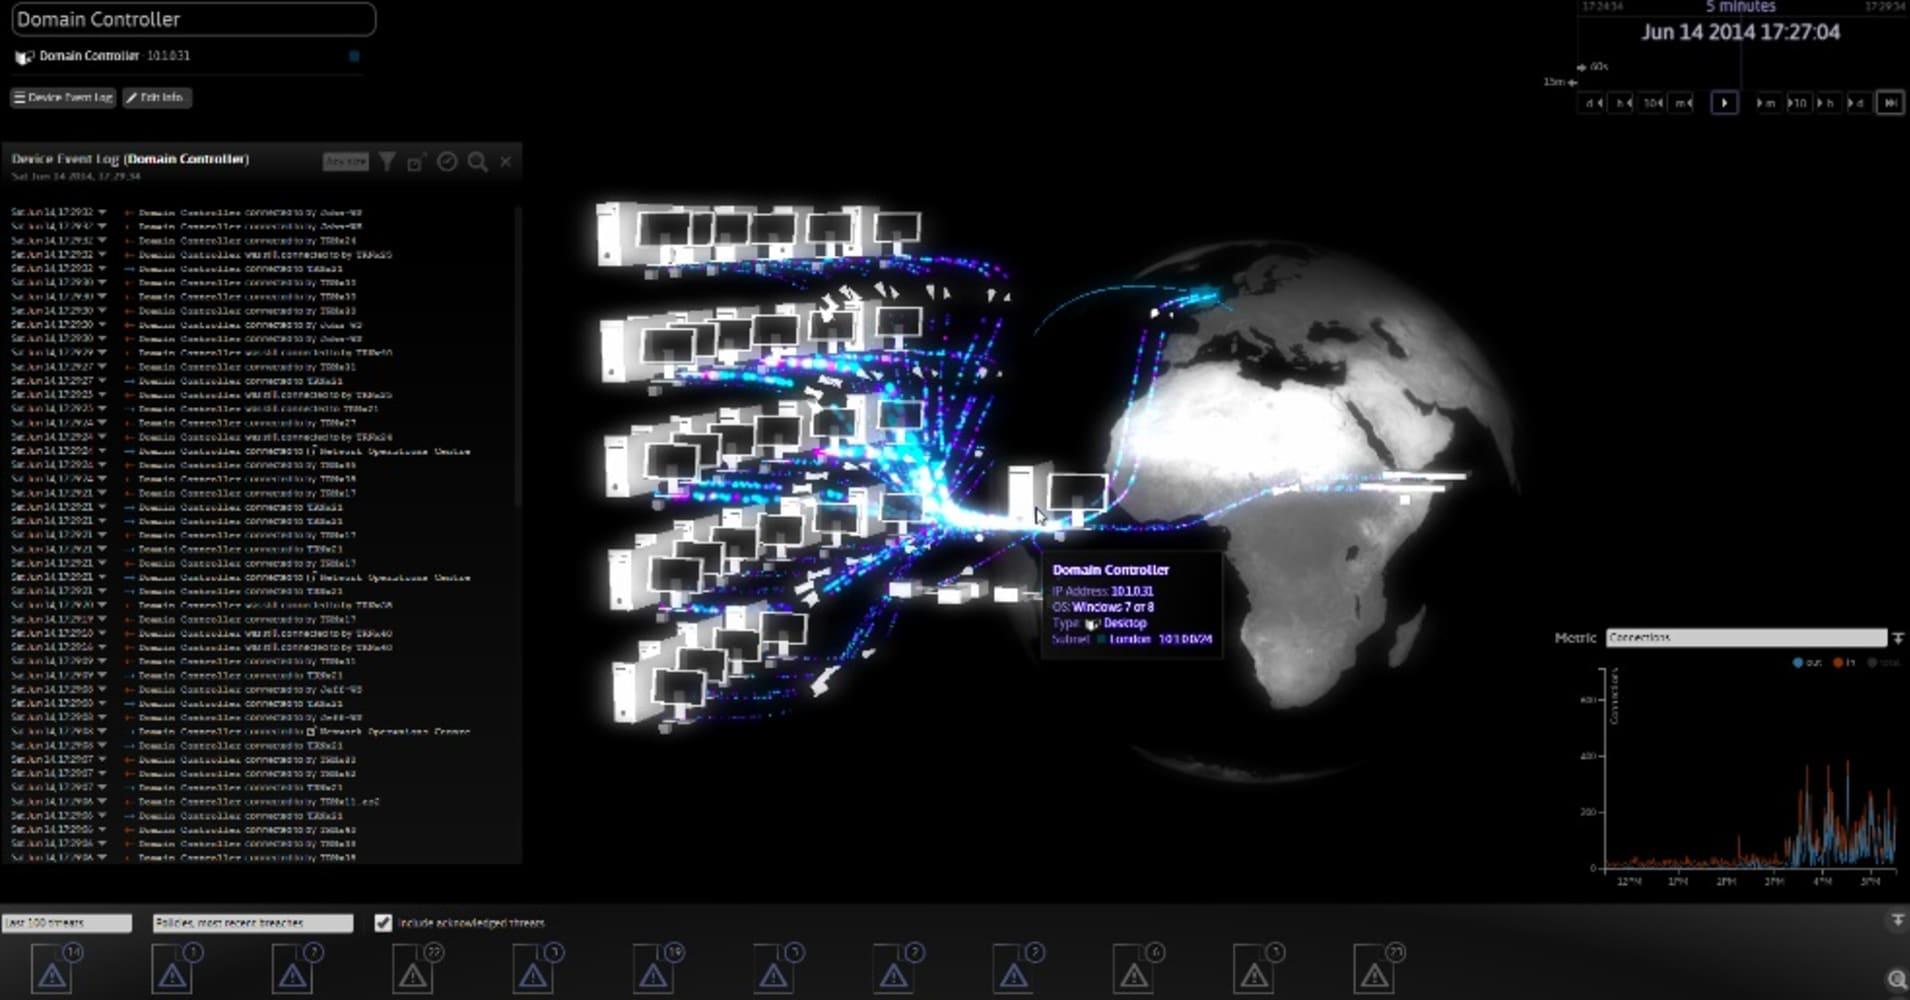 Billiondollar startup Darktrace is fighting cybercrime